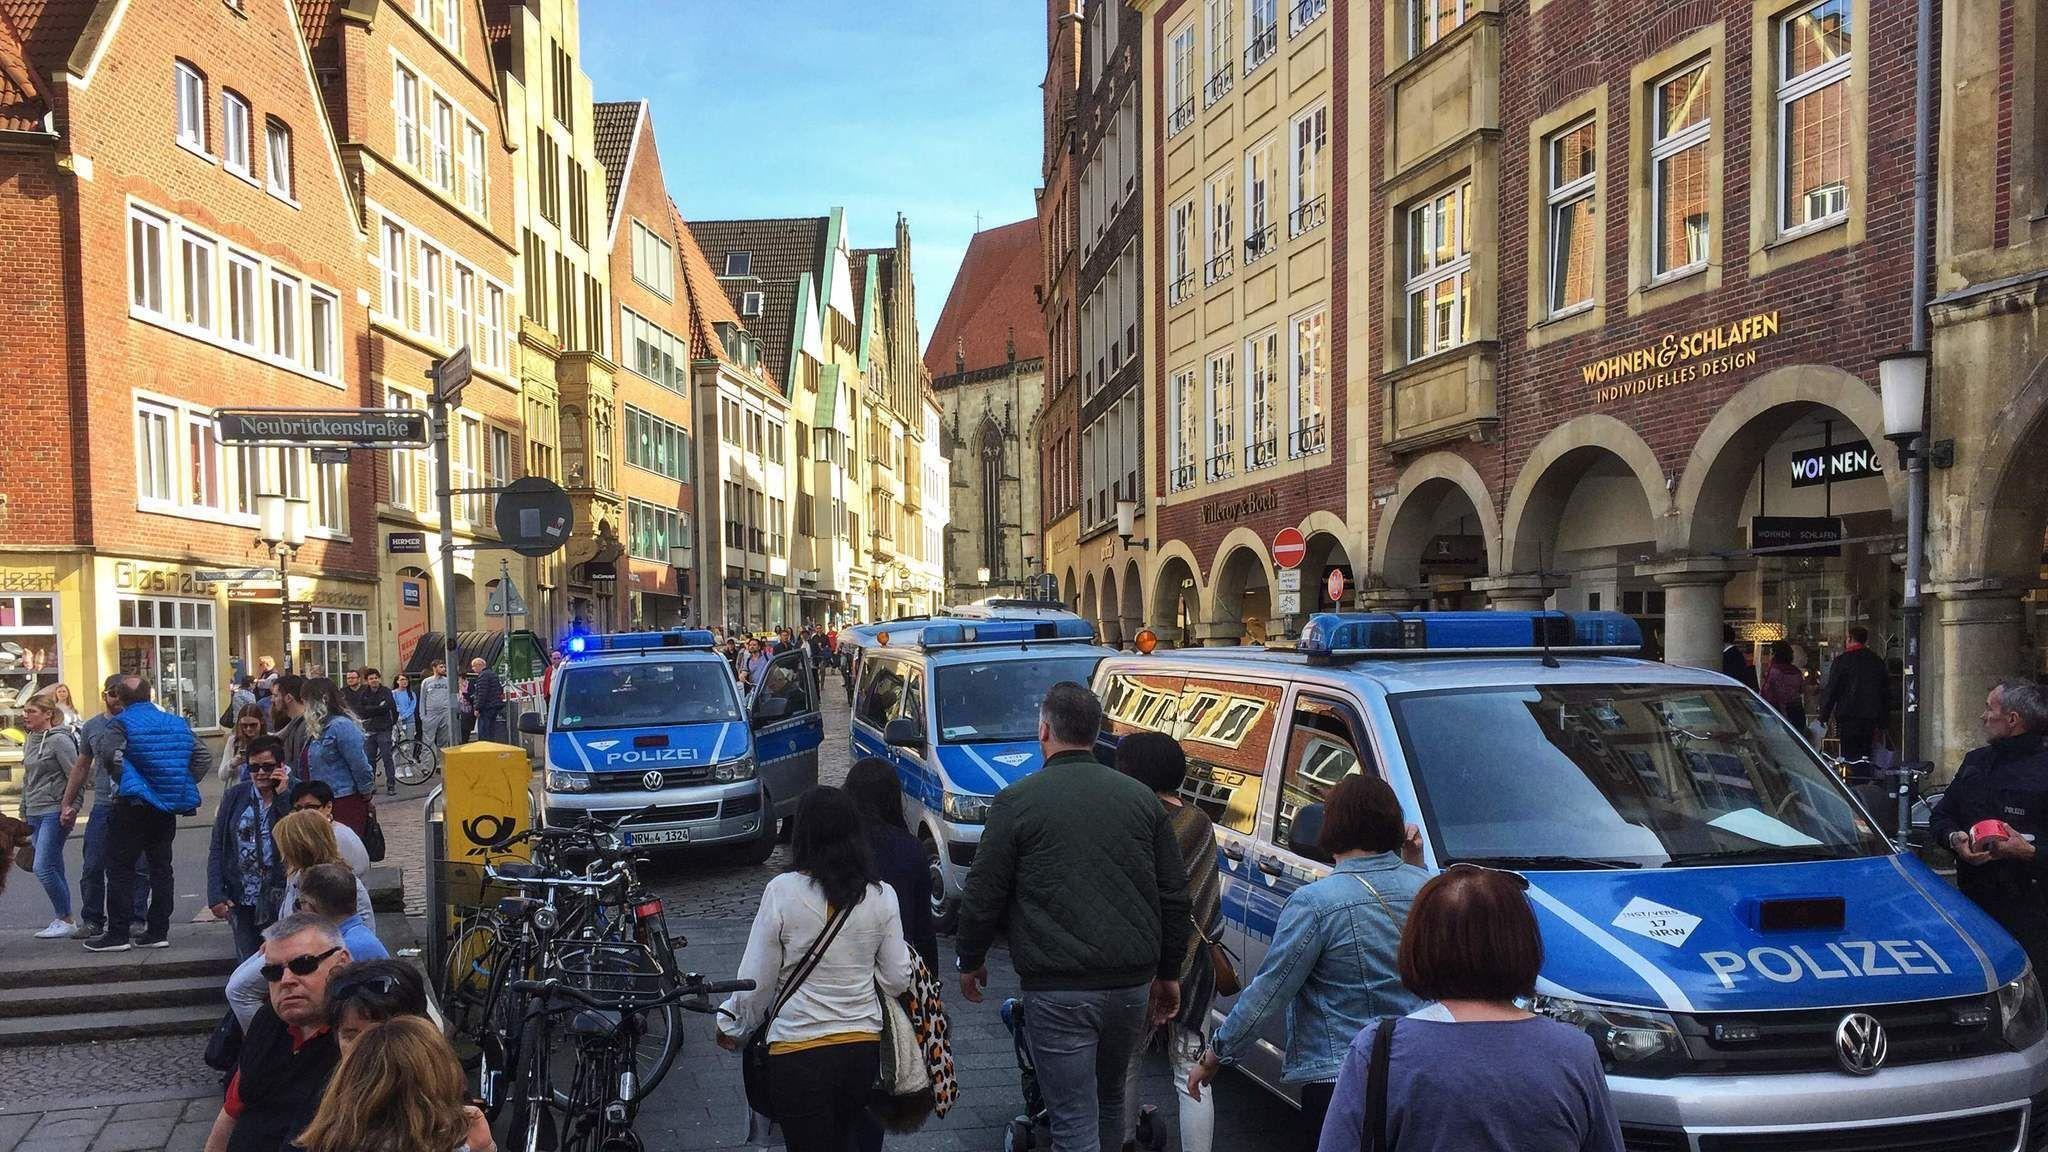 Van s crash into a crowd in Germany kills 2 injures 20 police say